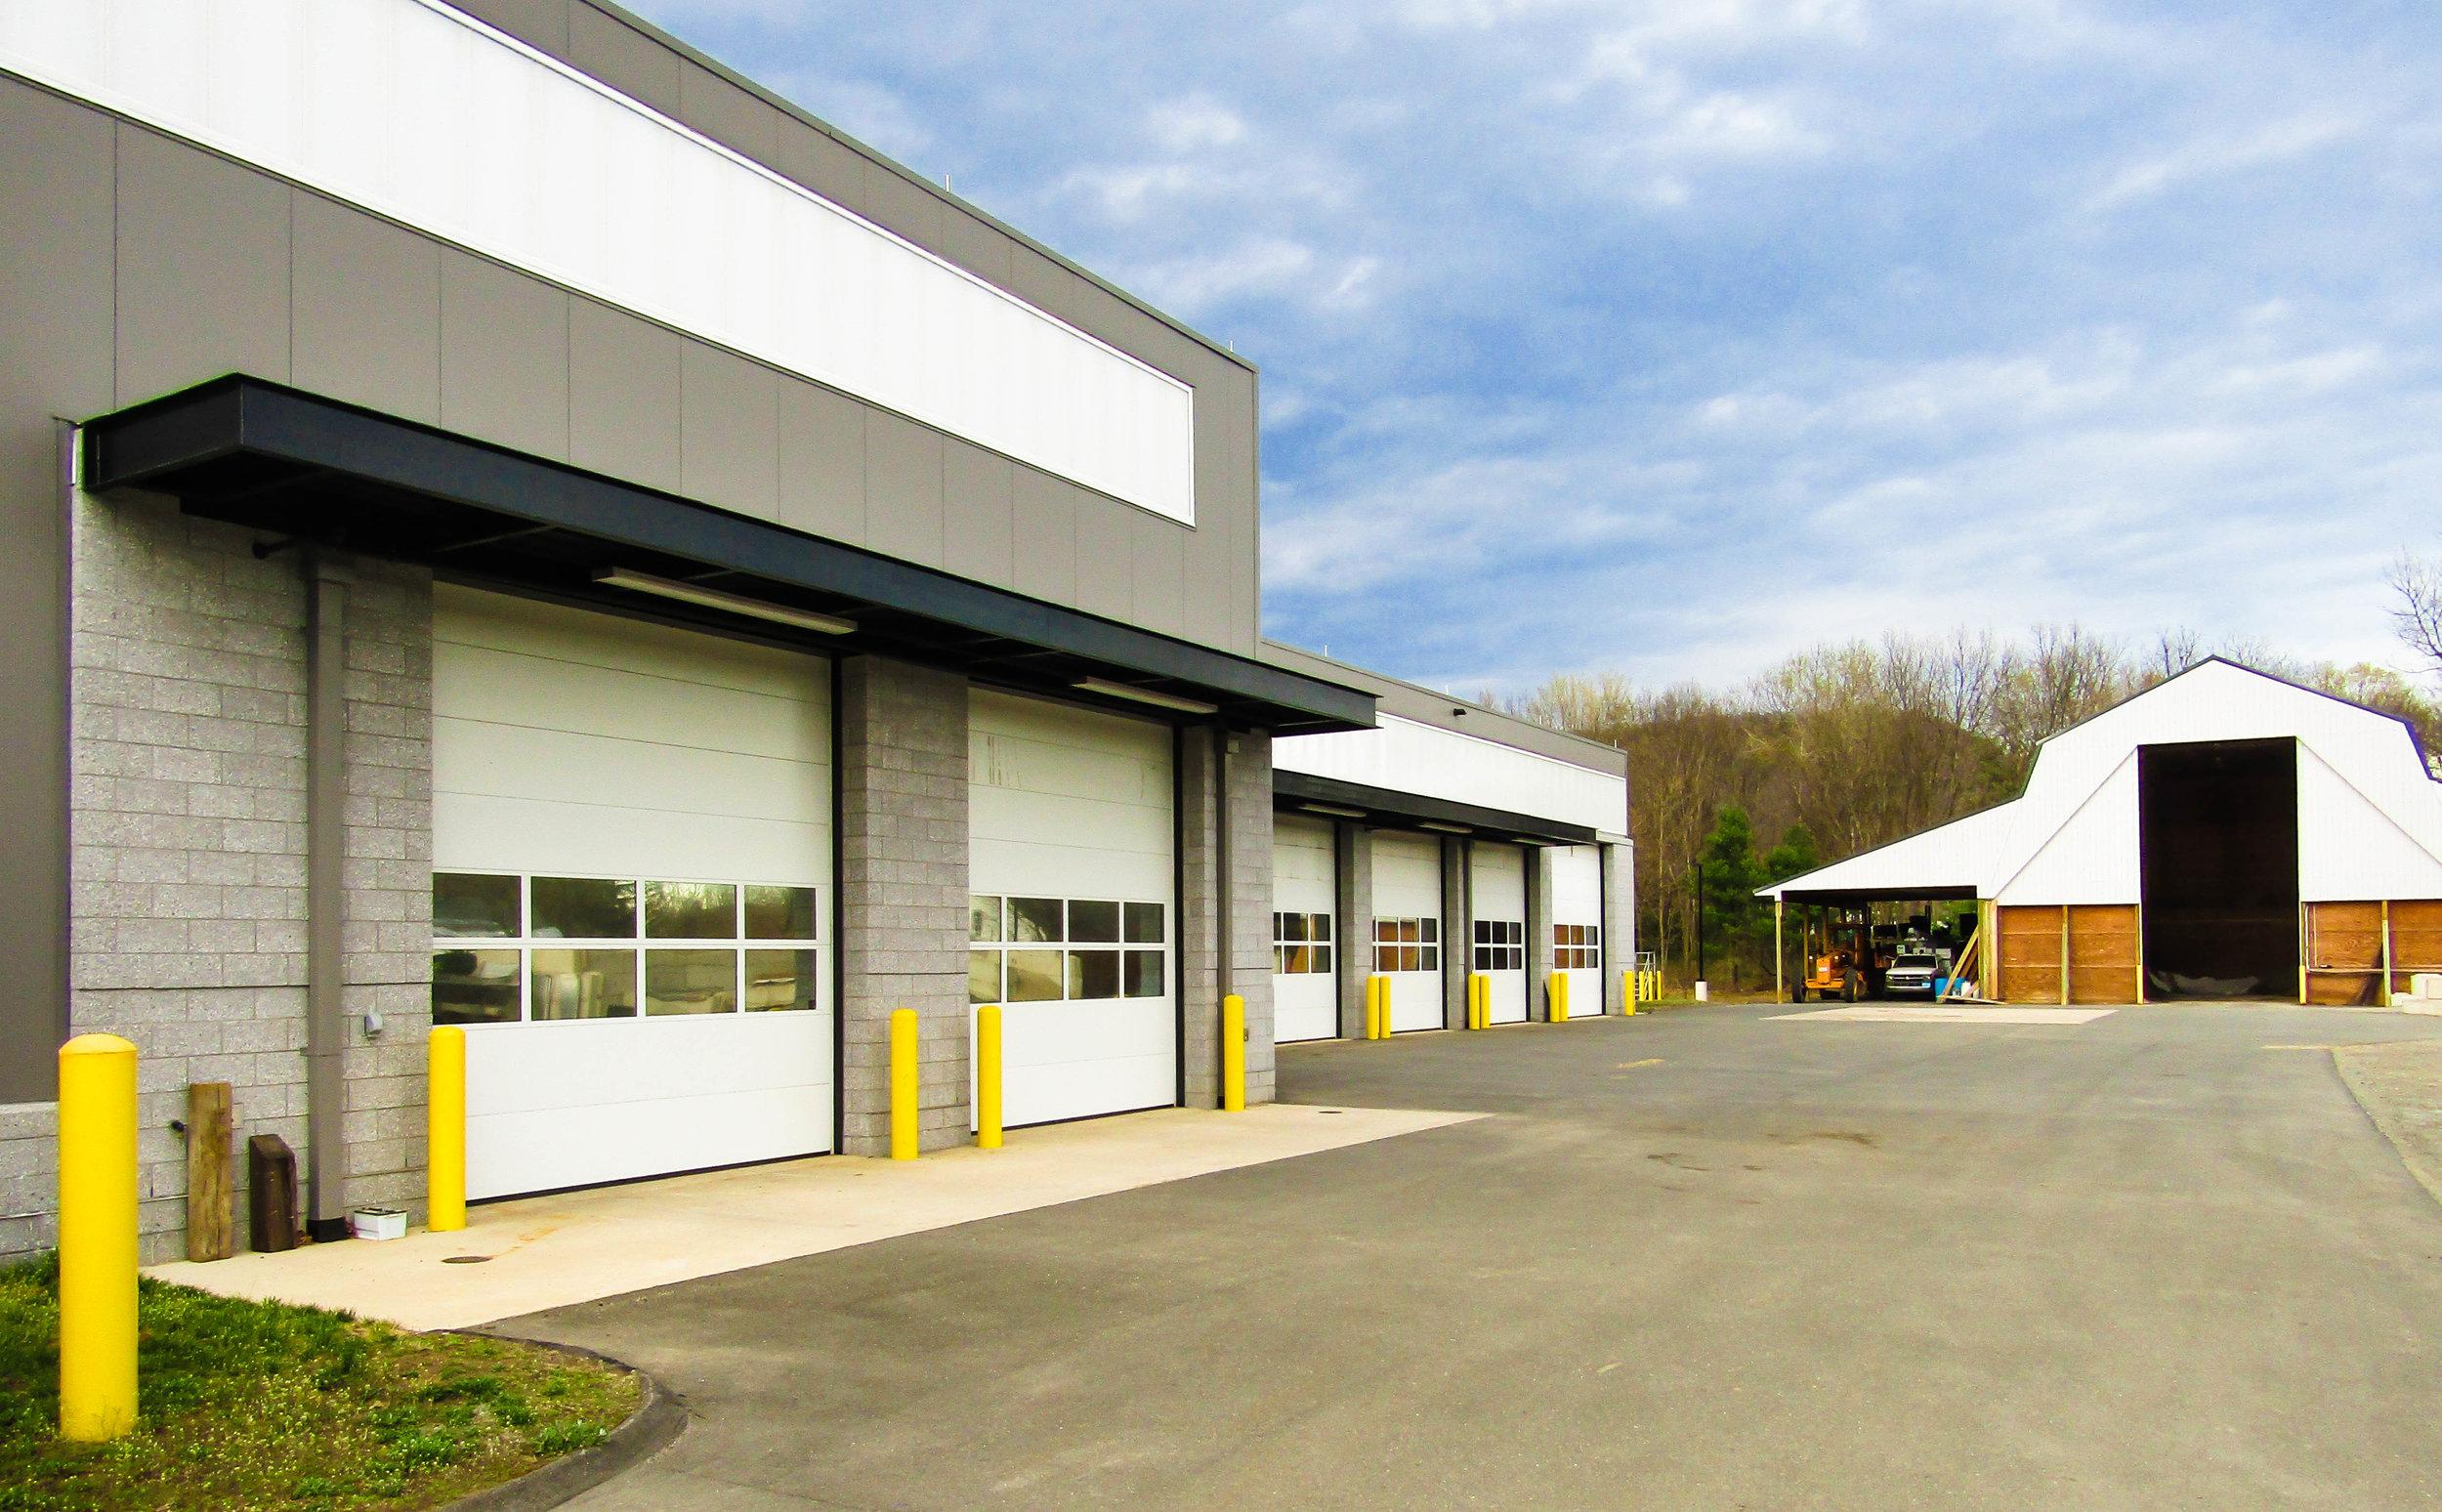 Deerfield Highway Facility